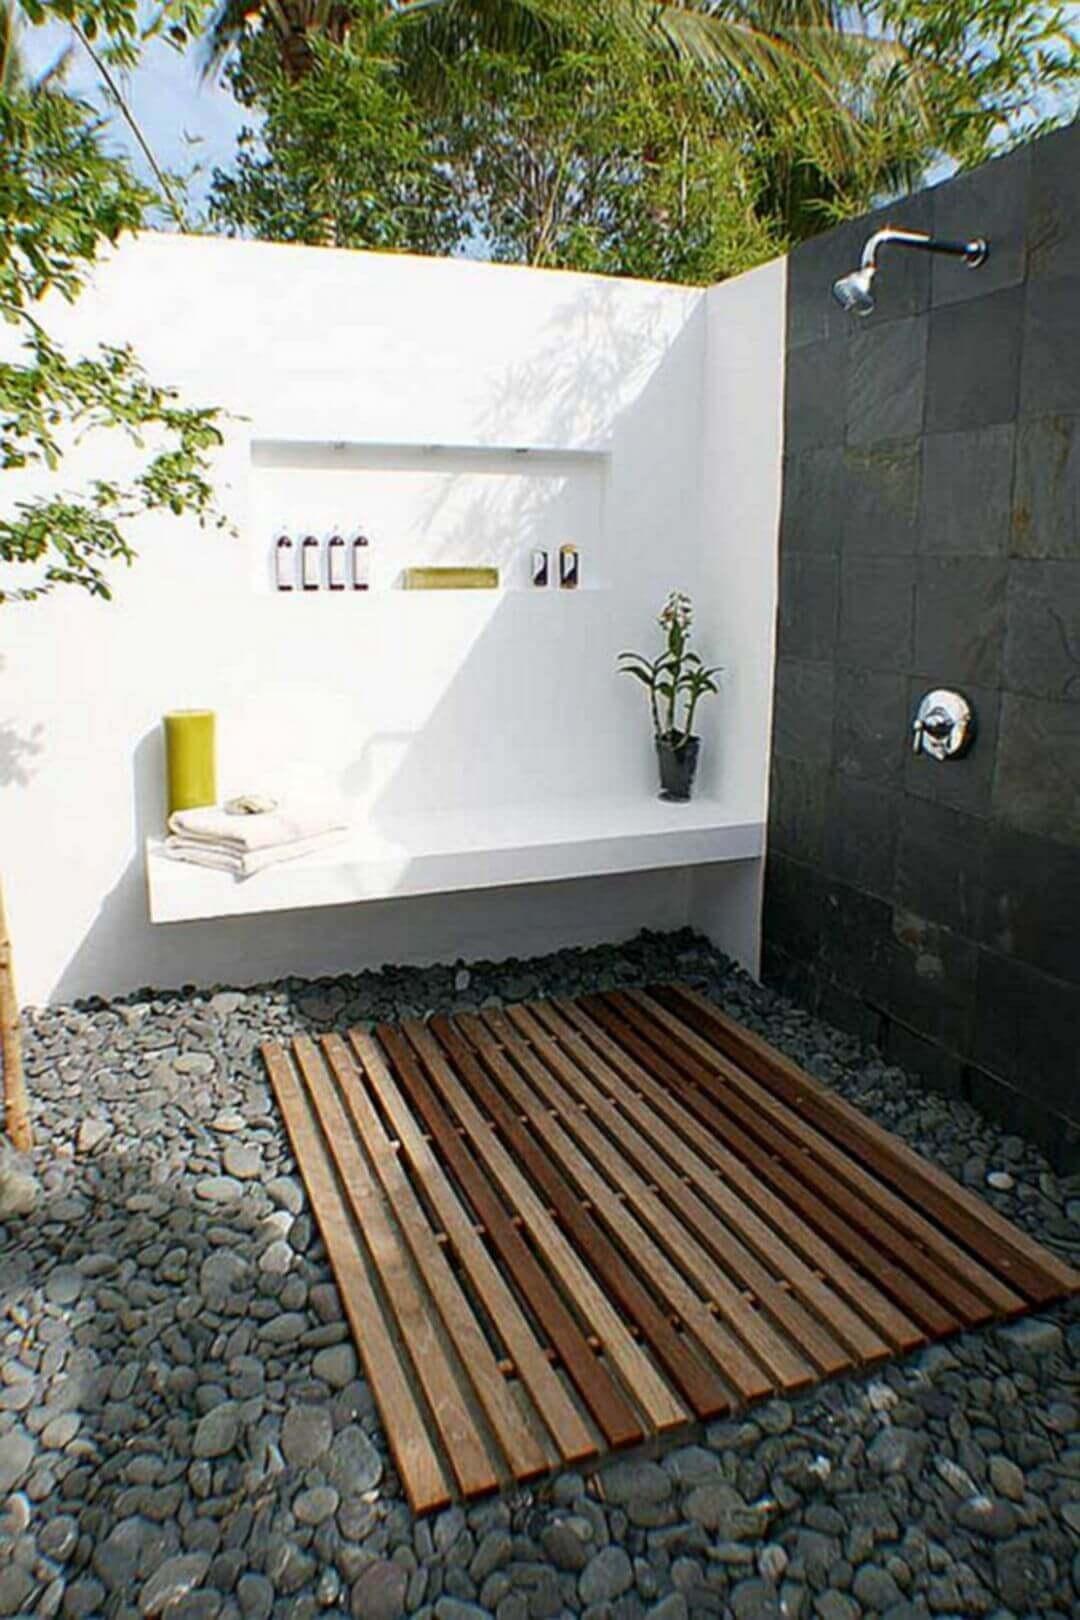 Outdoor Shower Design Ideas with Modern Approach - Harptimes.com